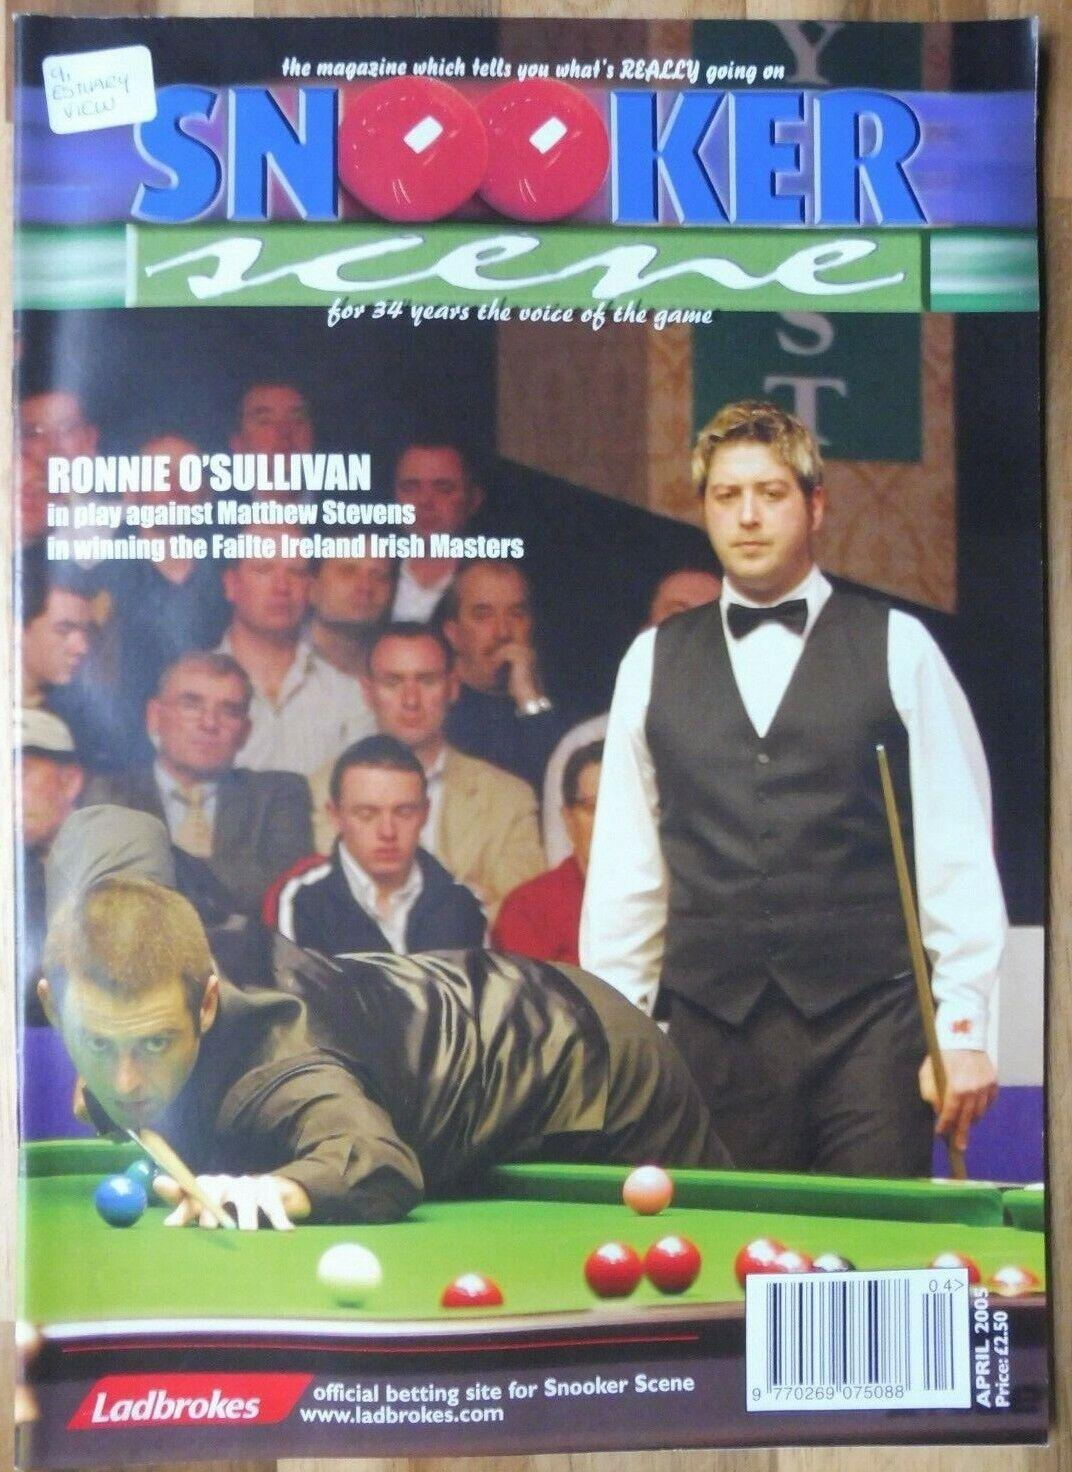 Snooker Scene Magazine, April 2005, Good Condition.